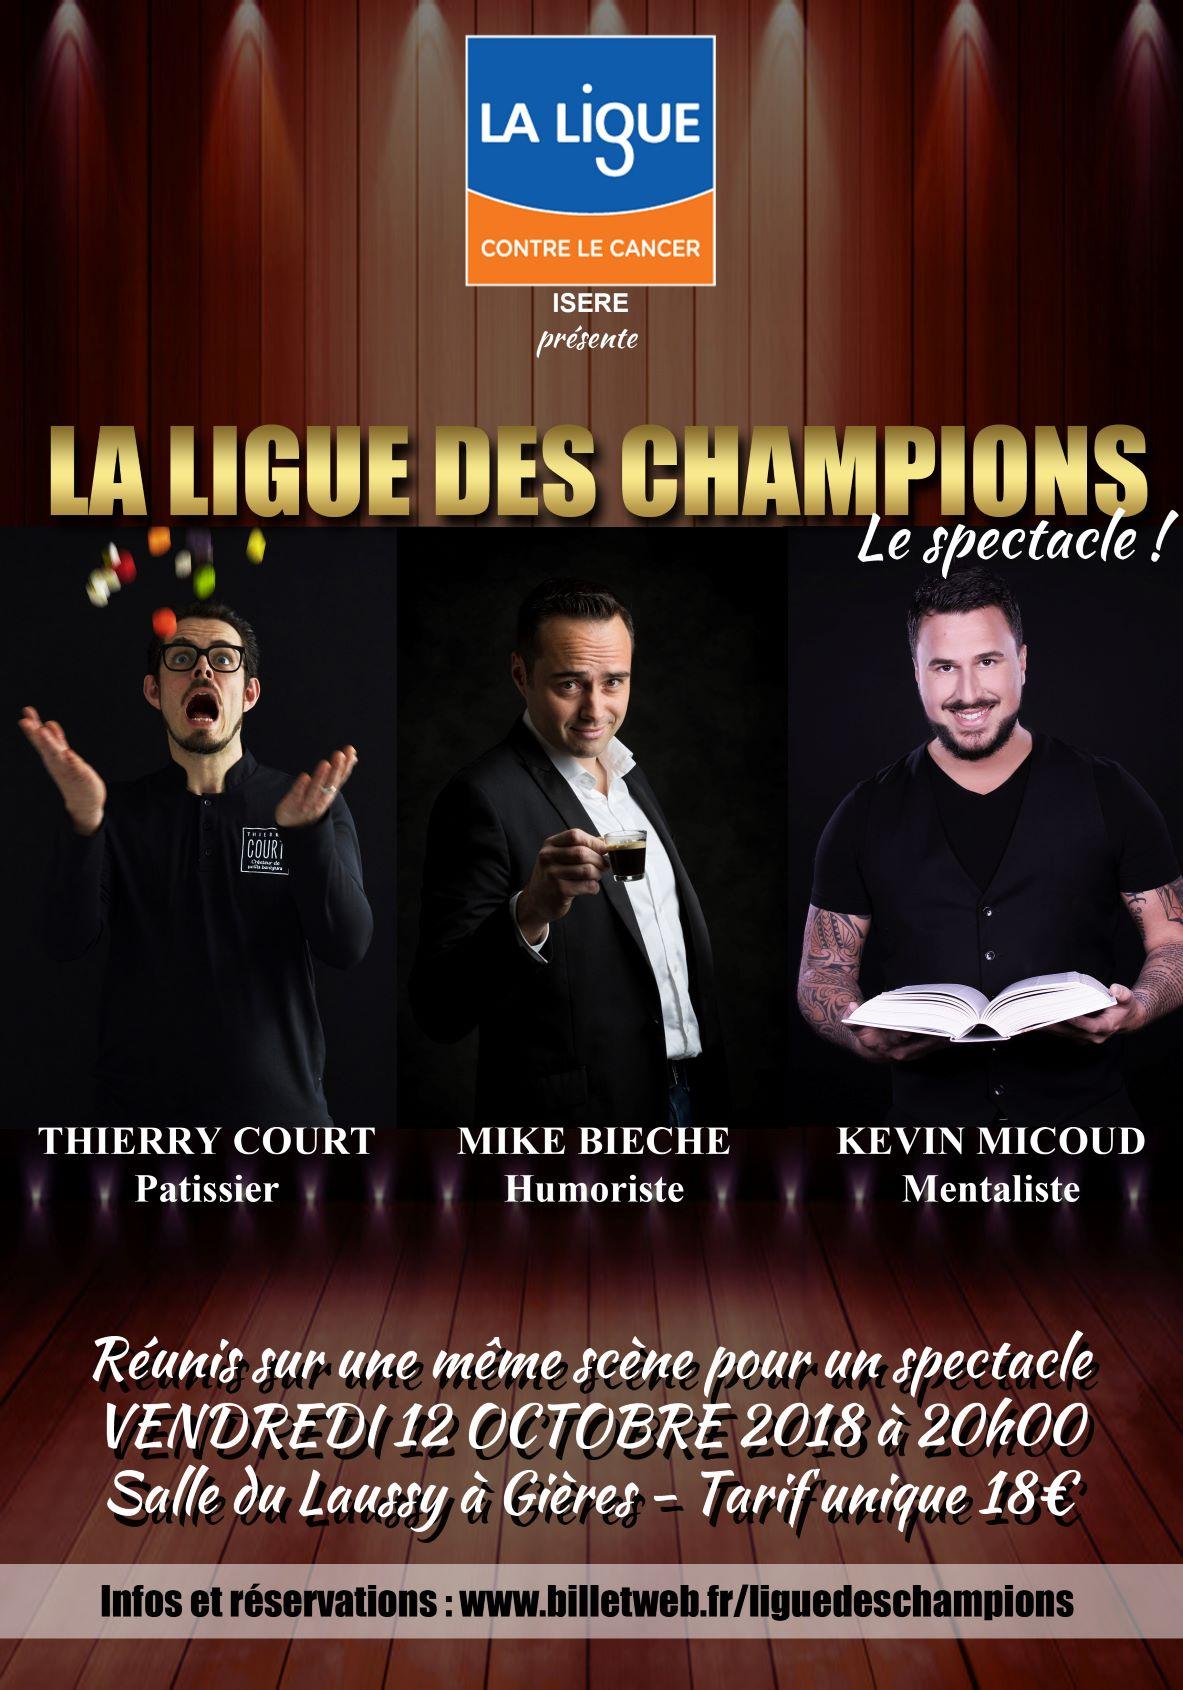 Kevin Micoud Mickael Bieche Thierry Court Gières 12 octobre 2018